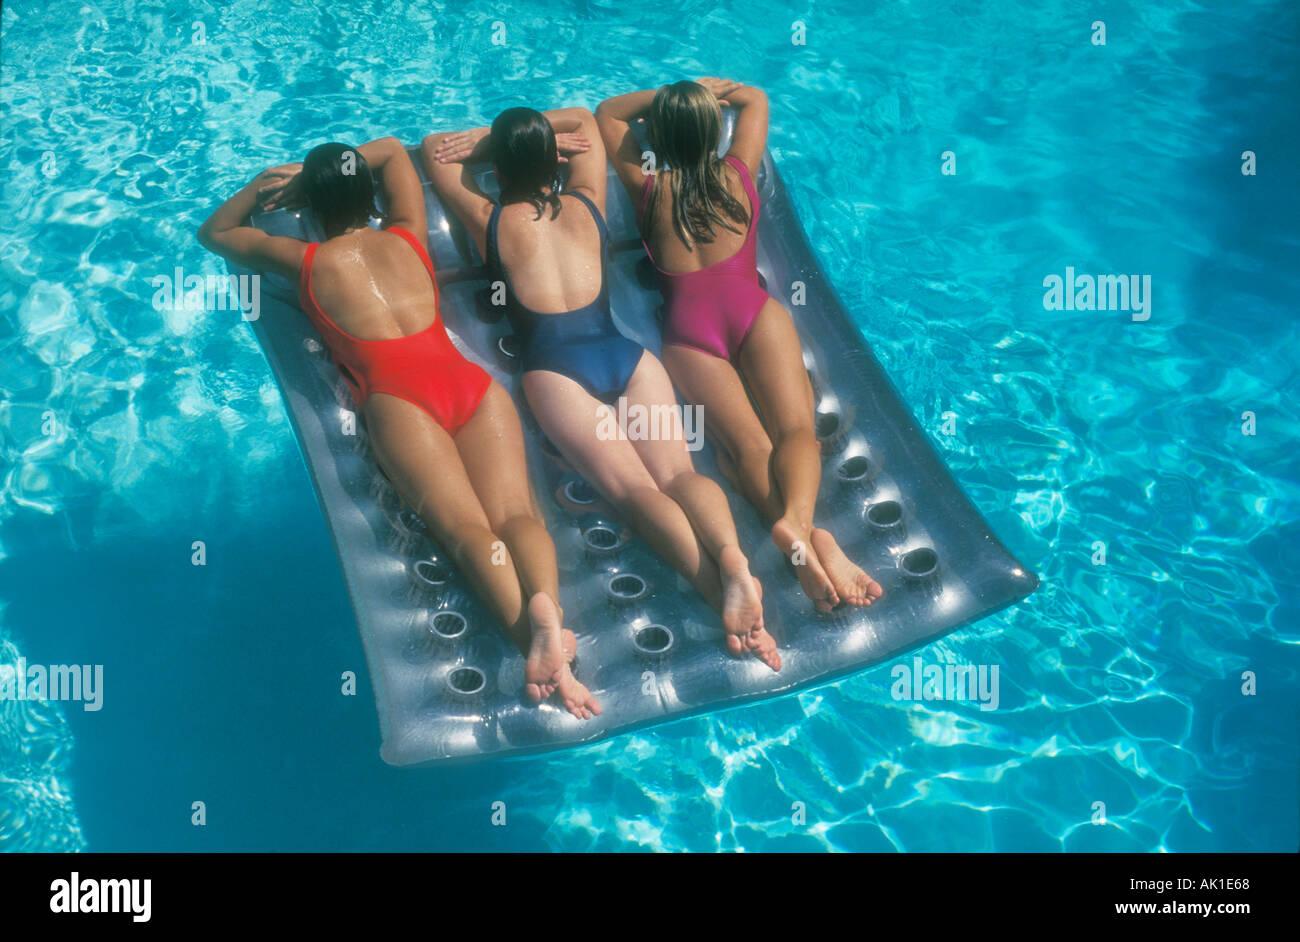 Girl teen swimmers